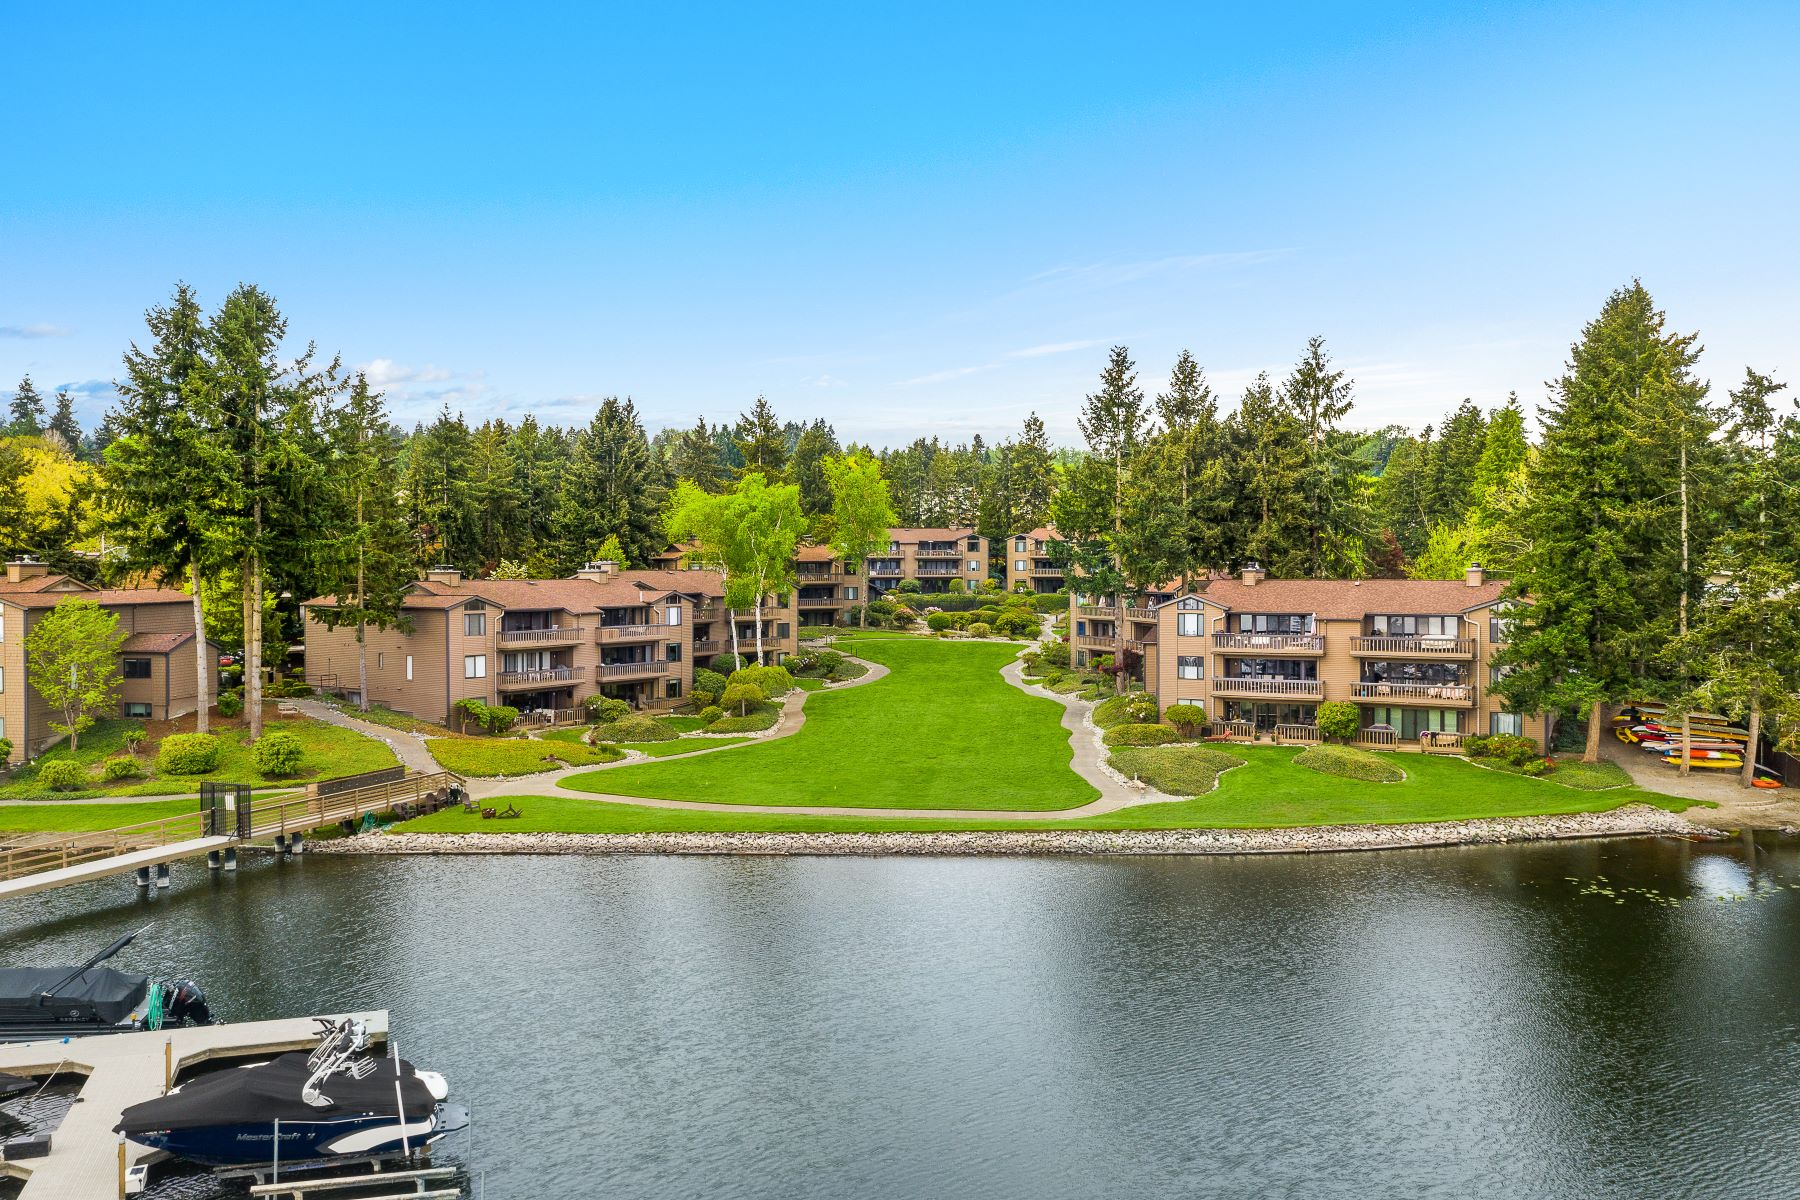 Condominiums vì Bán tại 17434 NE 40th Place Unit #C-5, Redmond, WA 98052 Redmond, Washington 98052 Hoa Kỳ